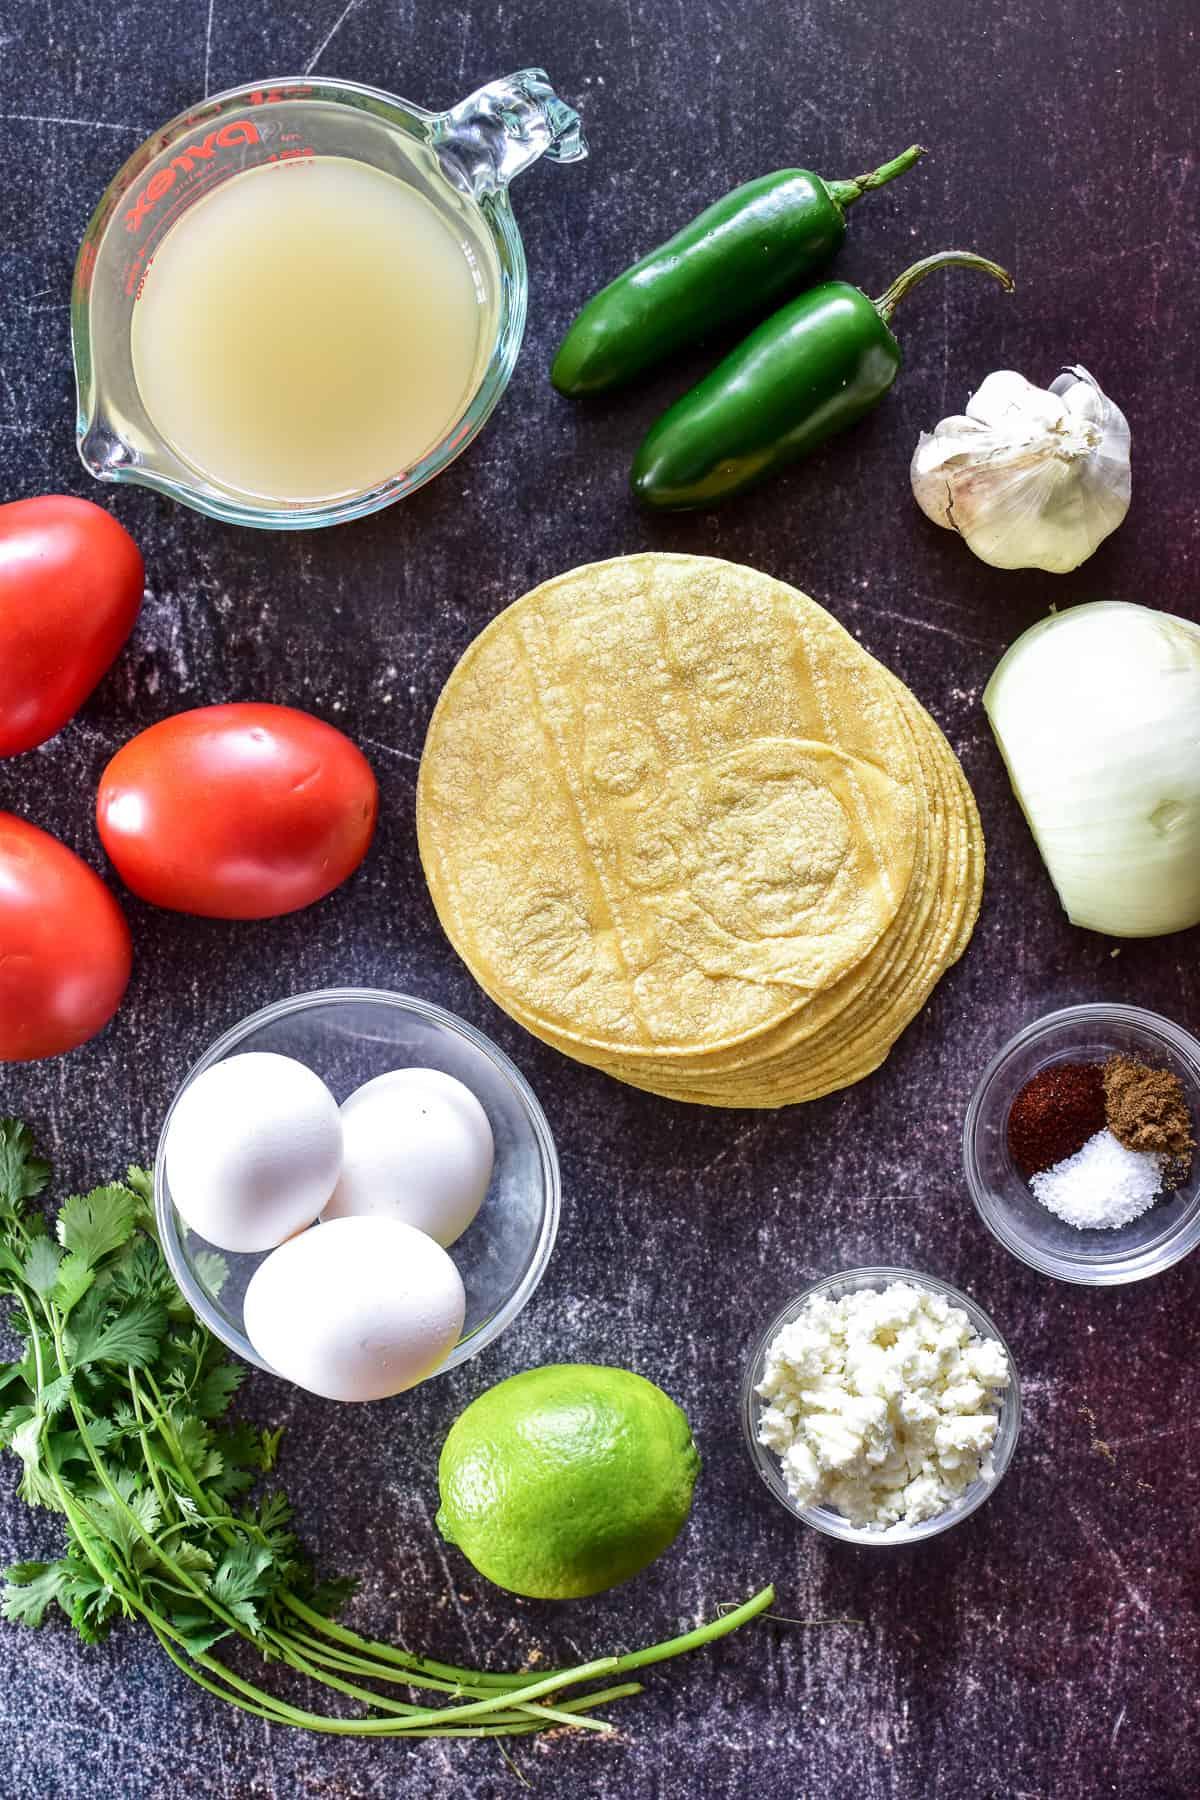 Chilaquiles ingredients on a dark background